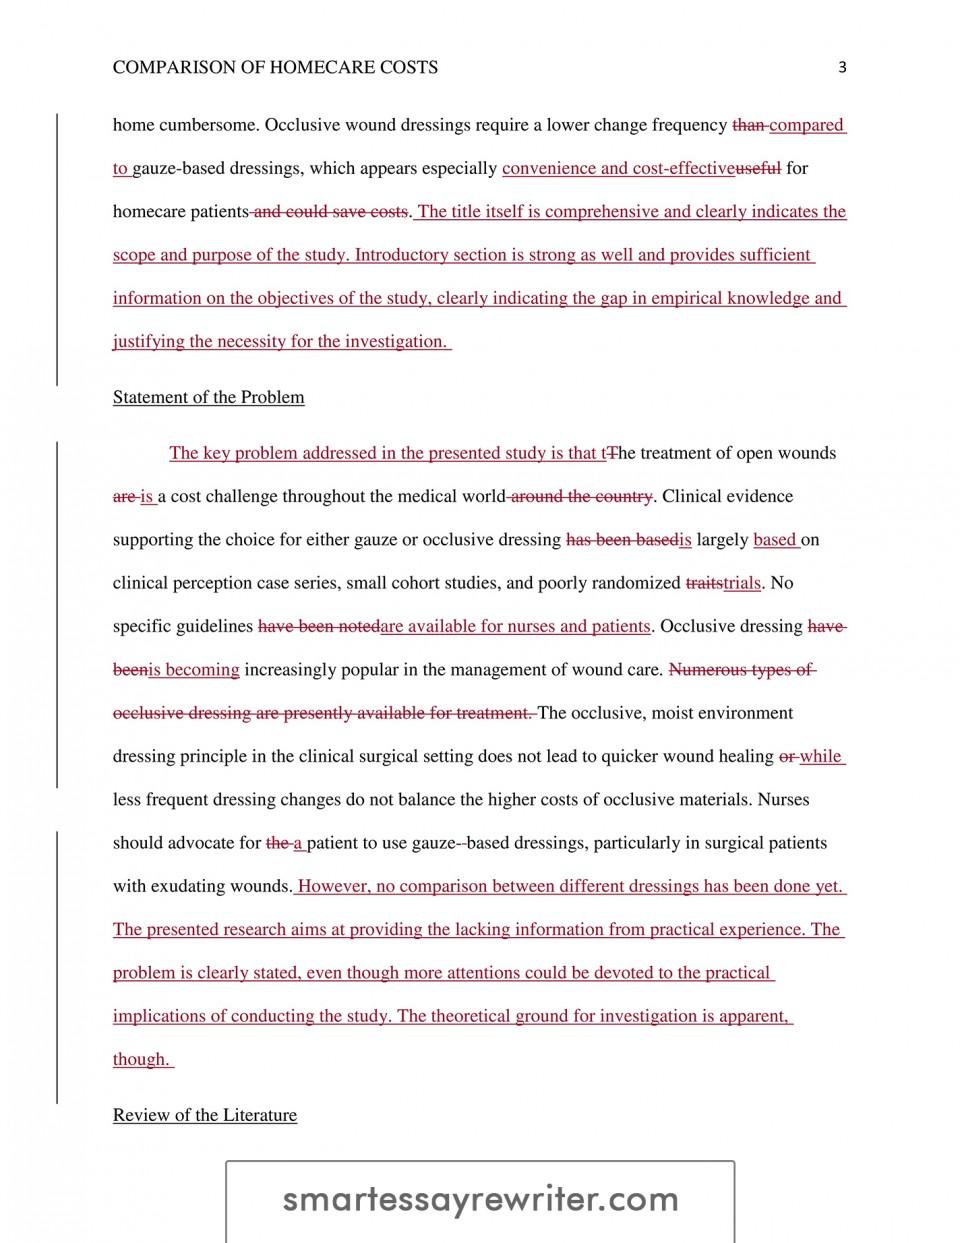 007 Essay Example Rewriter Smartessayrewriter Com Singular Free Software Crack Generator 960